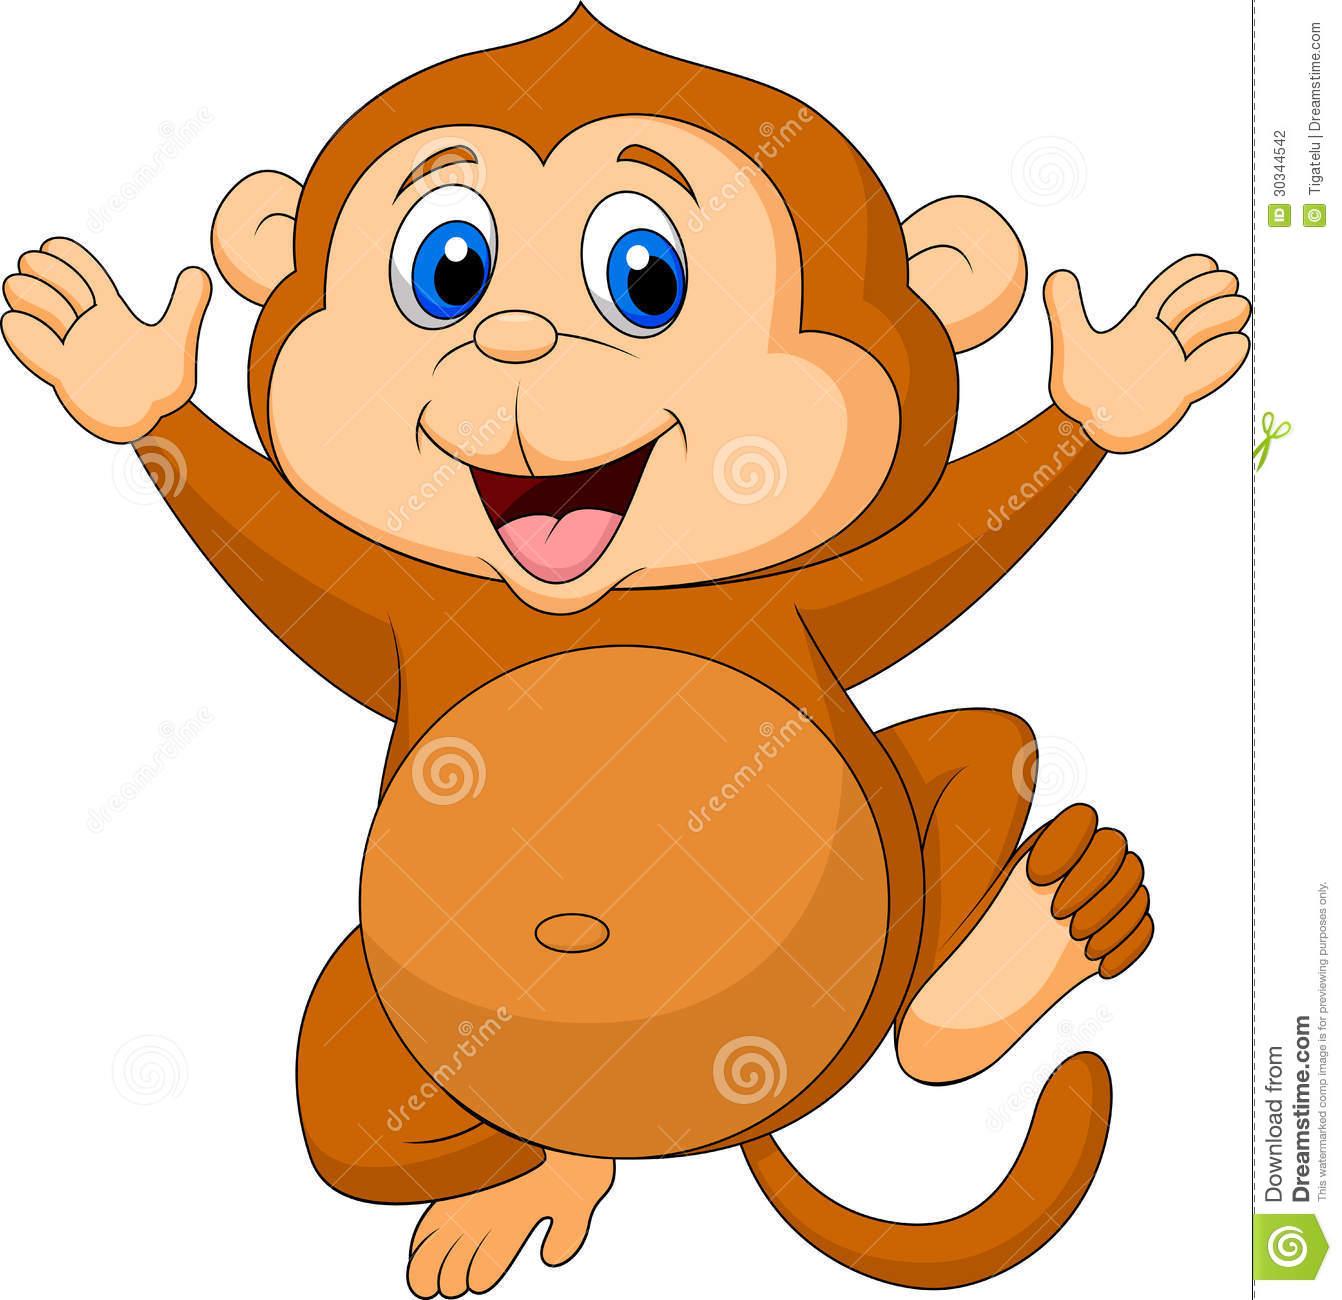 Cute Monkey Cartoon Stock Photography